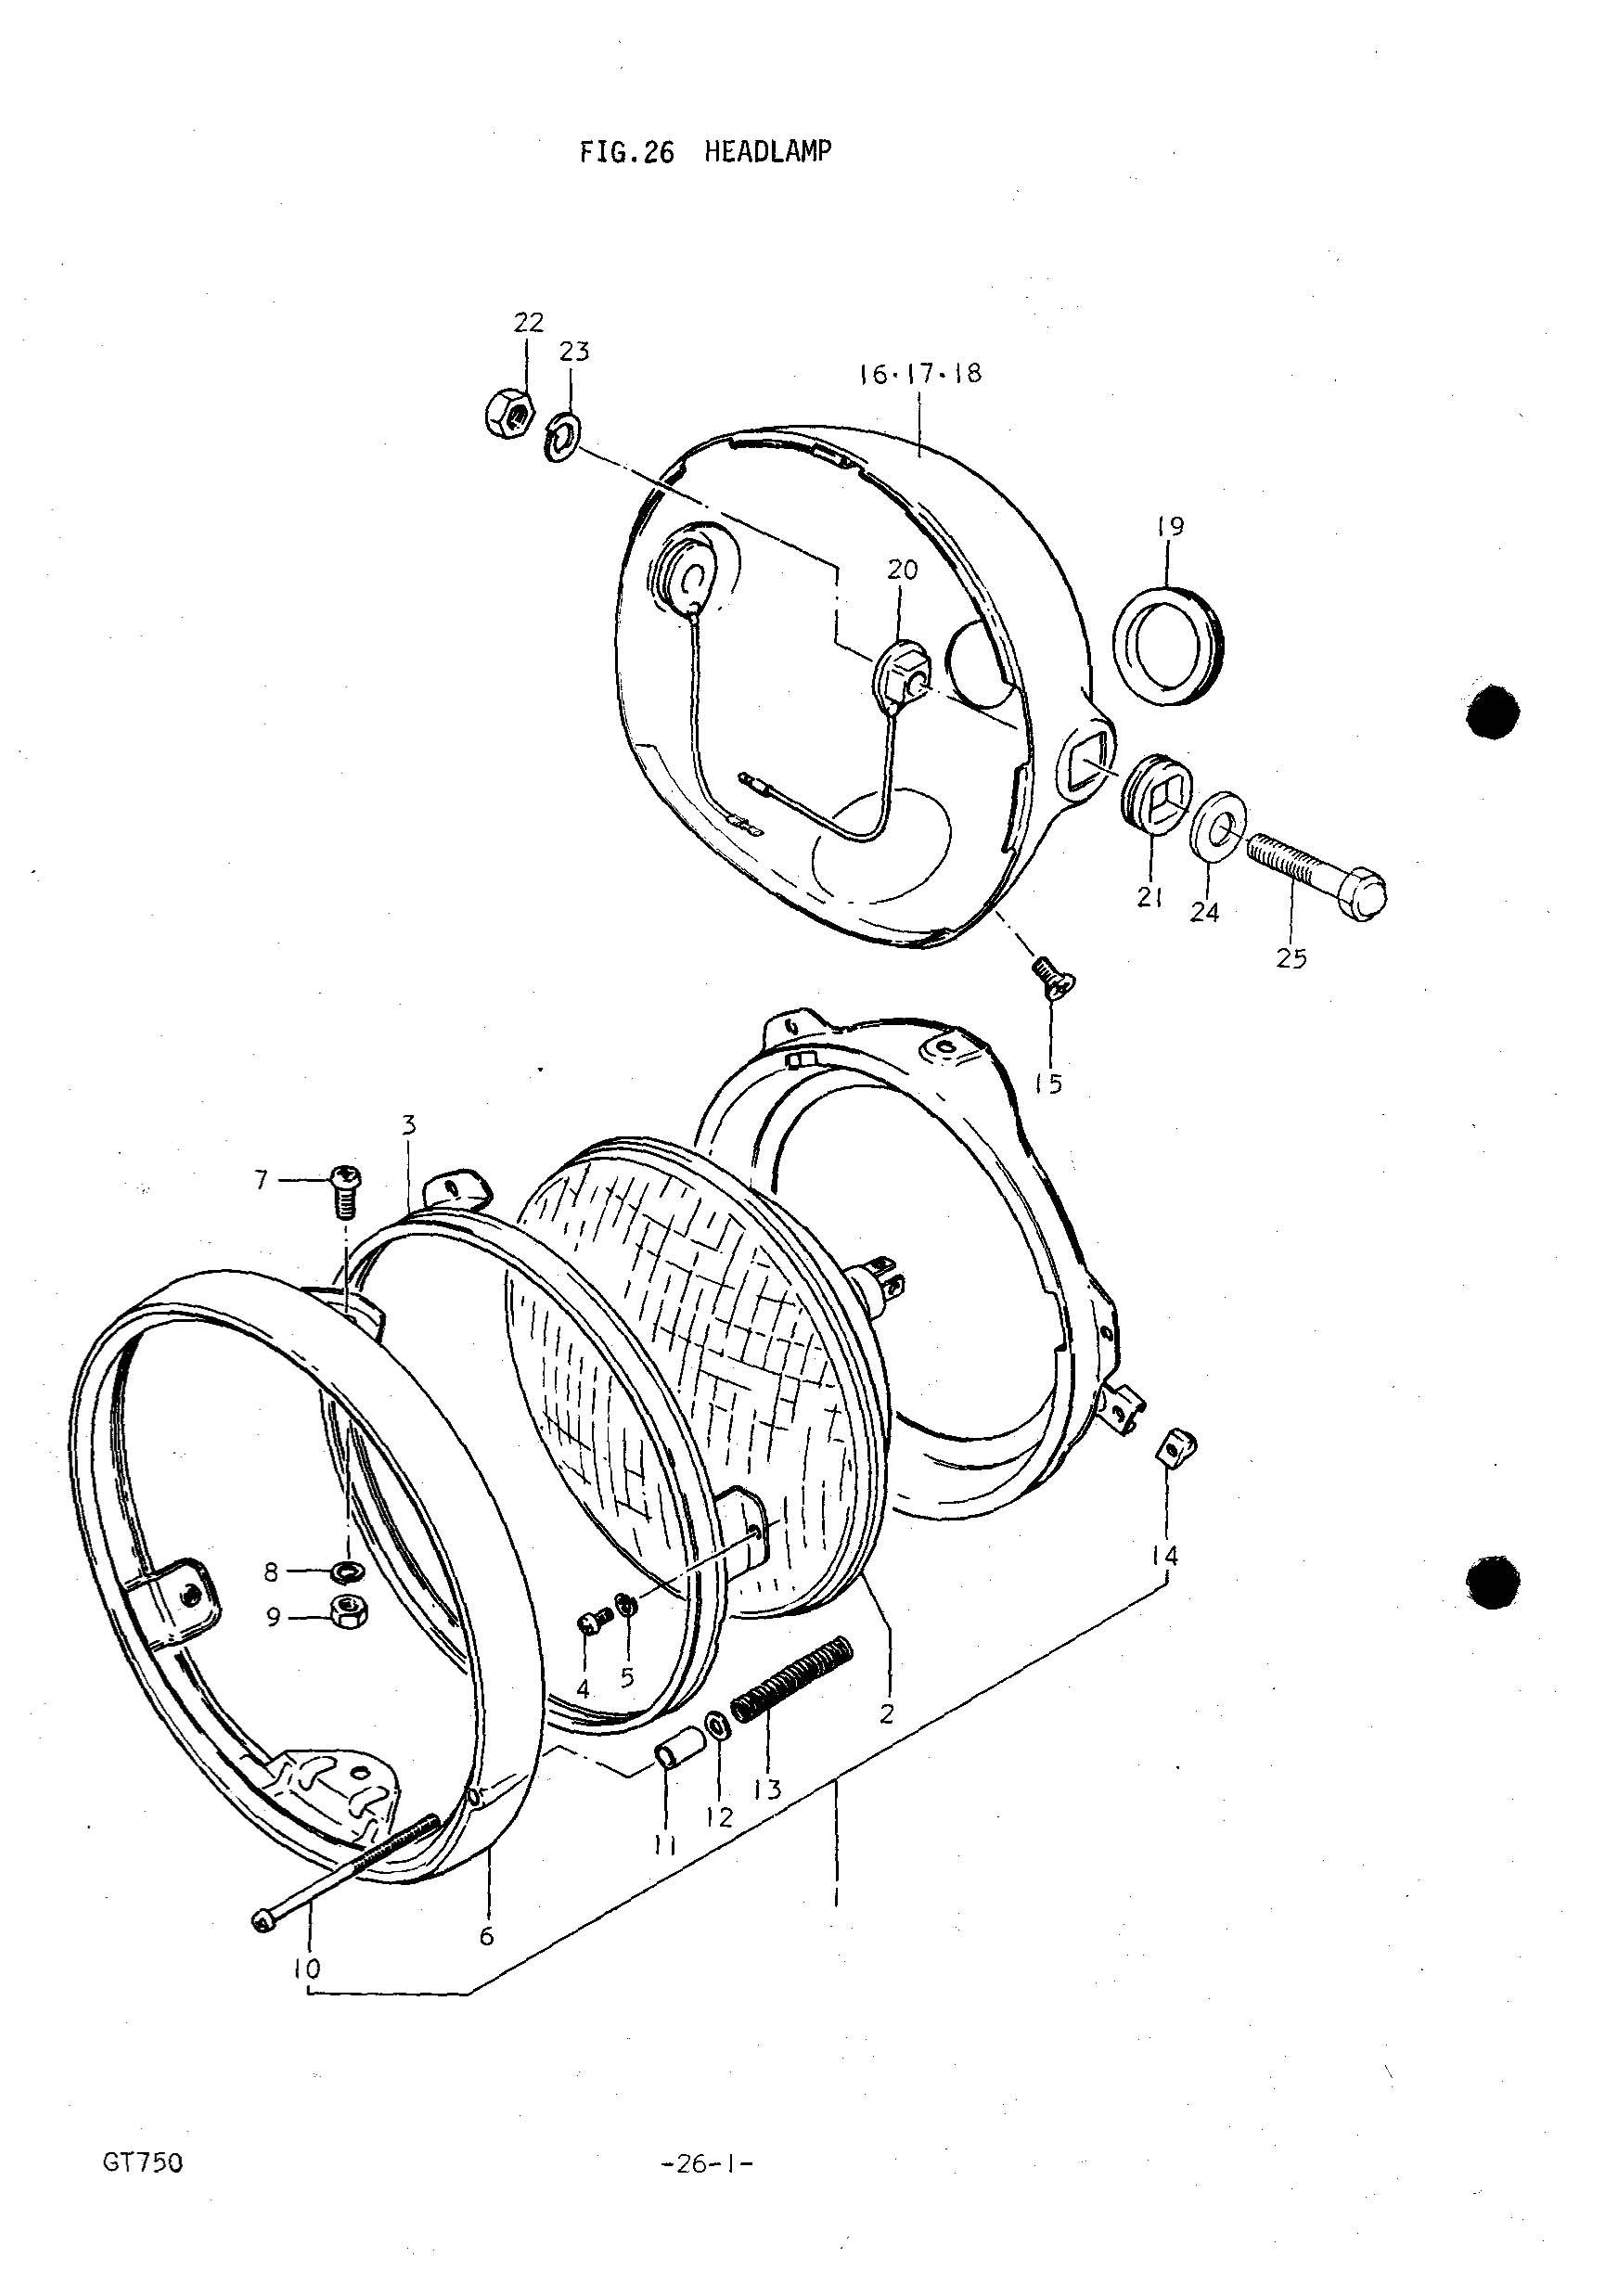 1980 suzuki gs250 wiring diagram 1980 suzuki gs wiring diagram